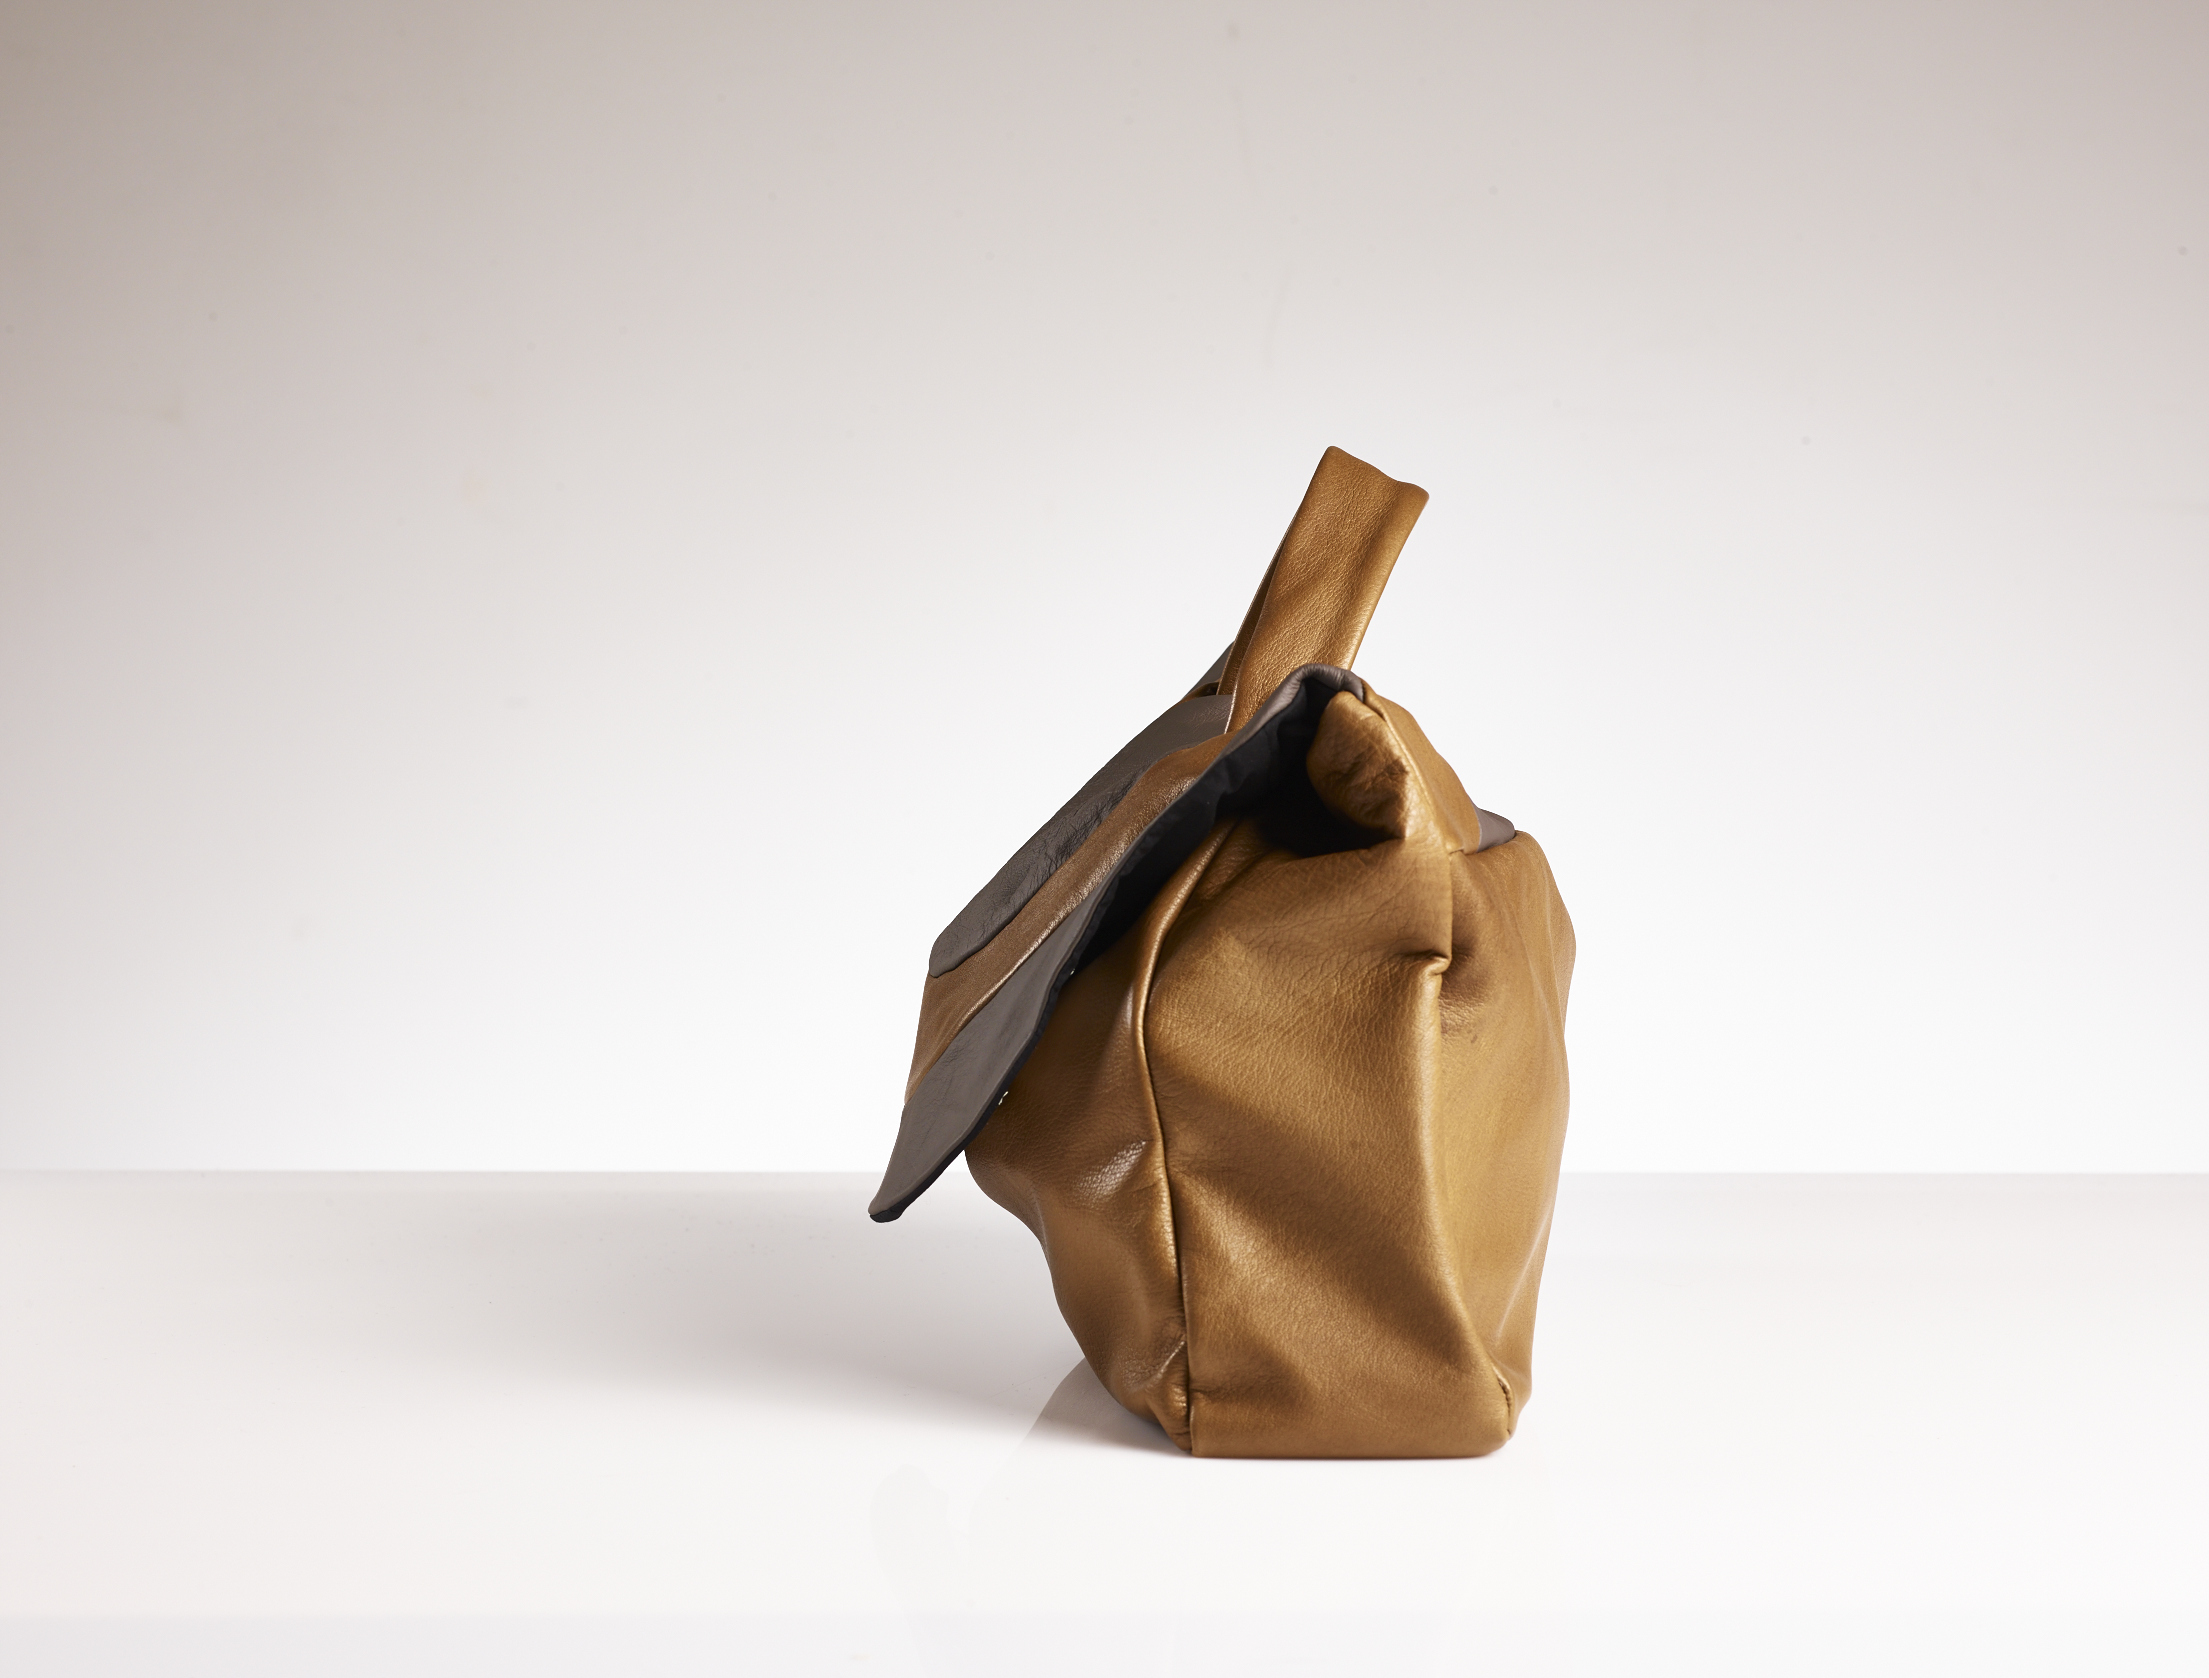 Strehlow handtasche_25980.jpg